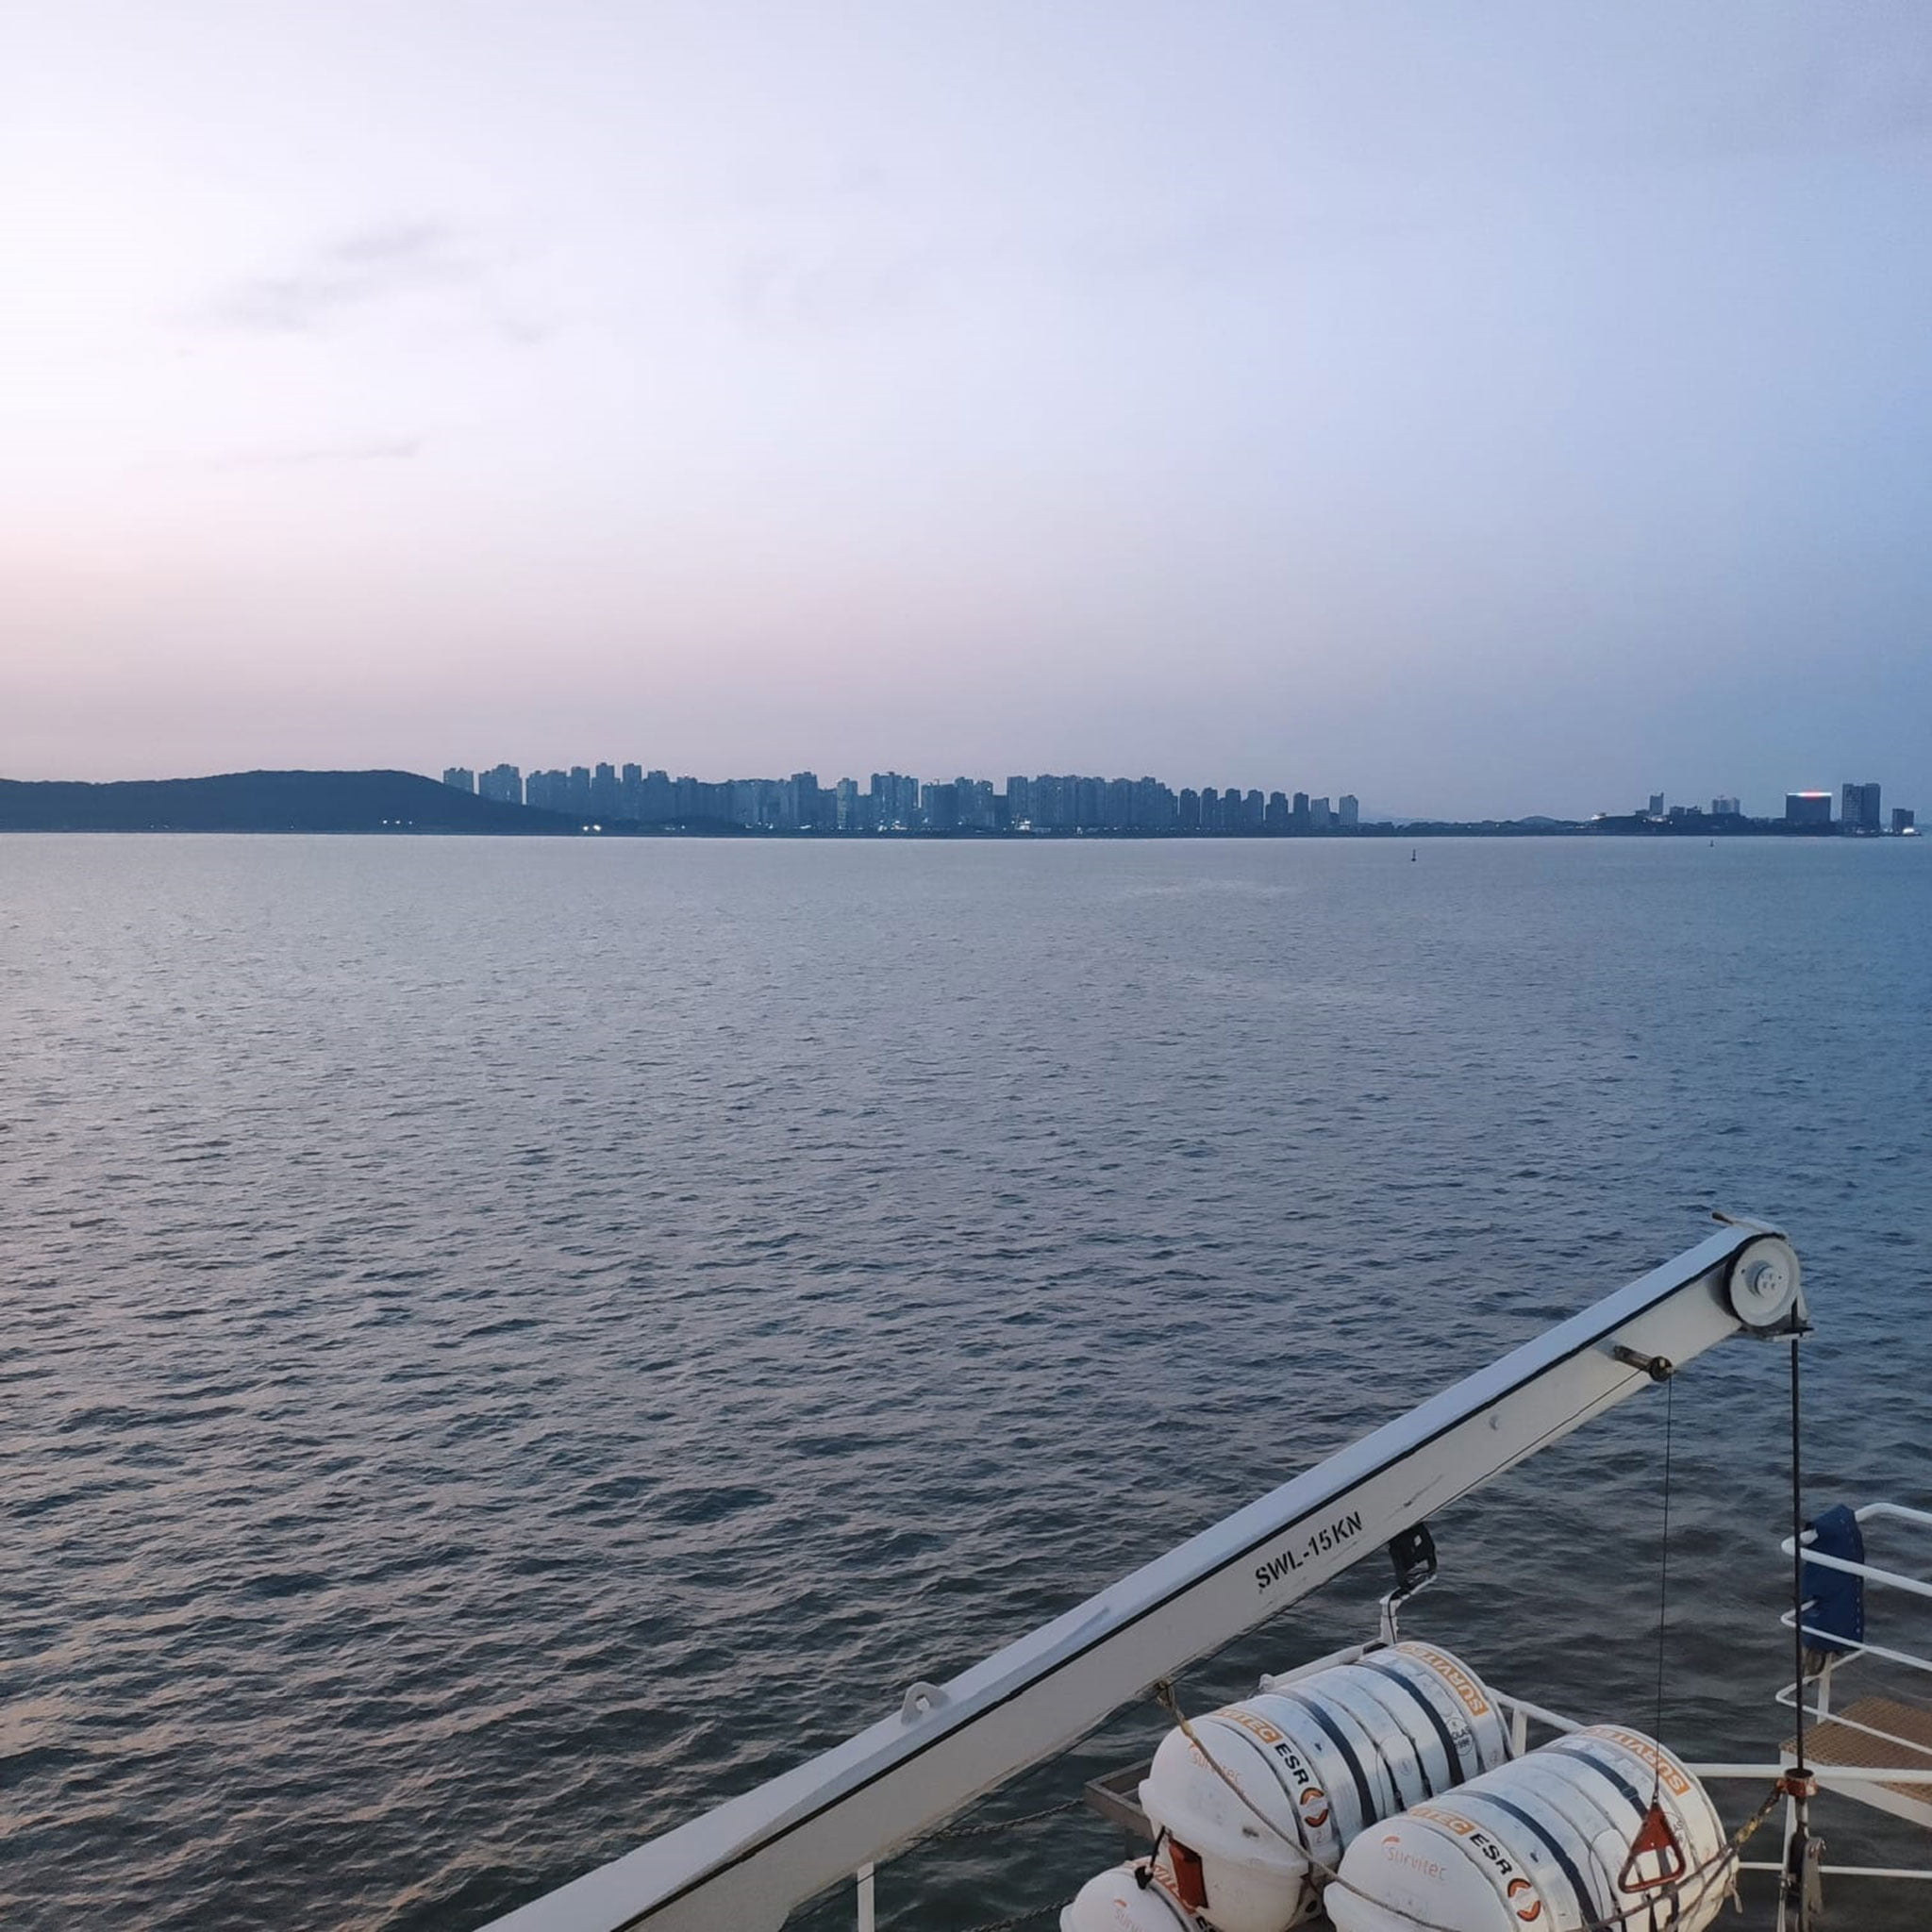 On the horizon, the capital of South Korea, Seoul